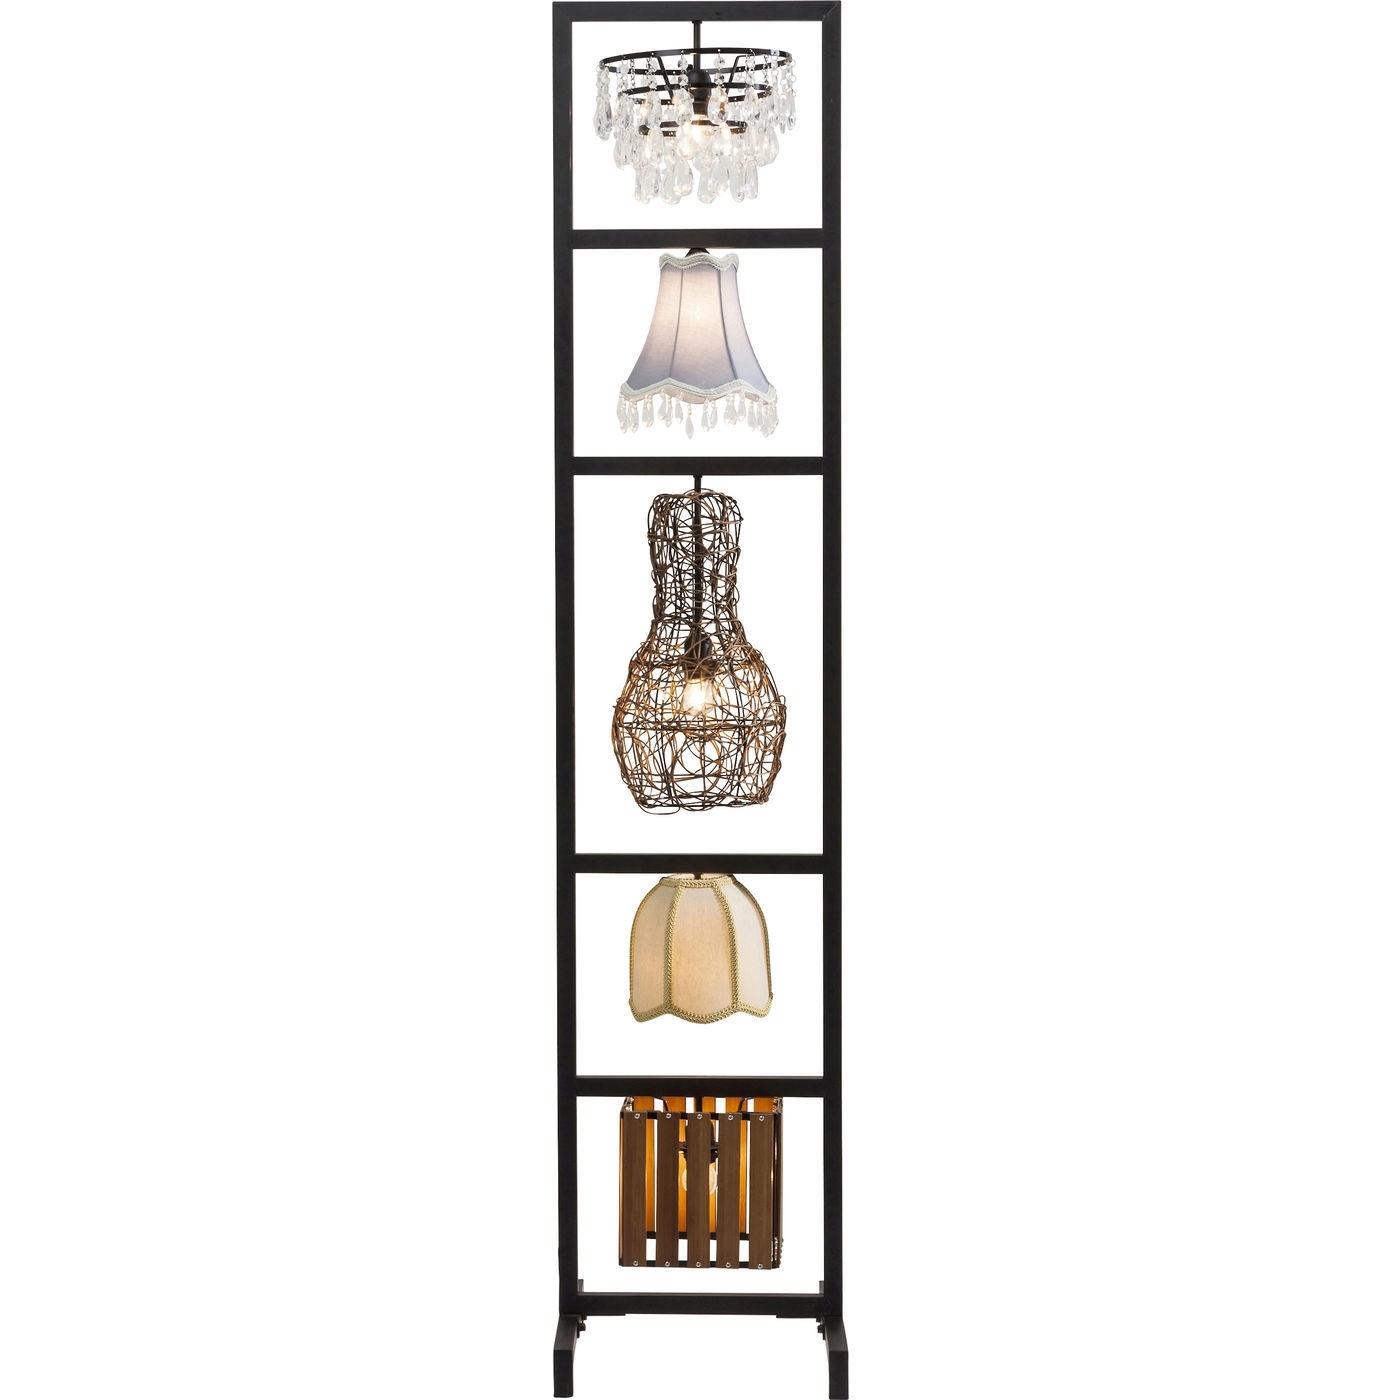 Leuchte Stehlampe Stehleuchte Lampe Parecchi Art House Small Neu